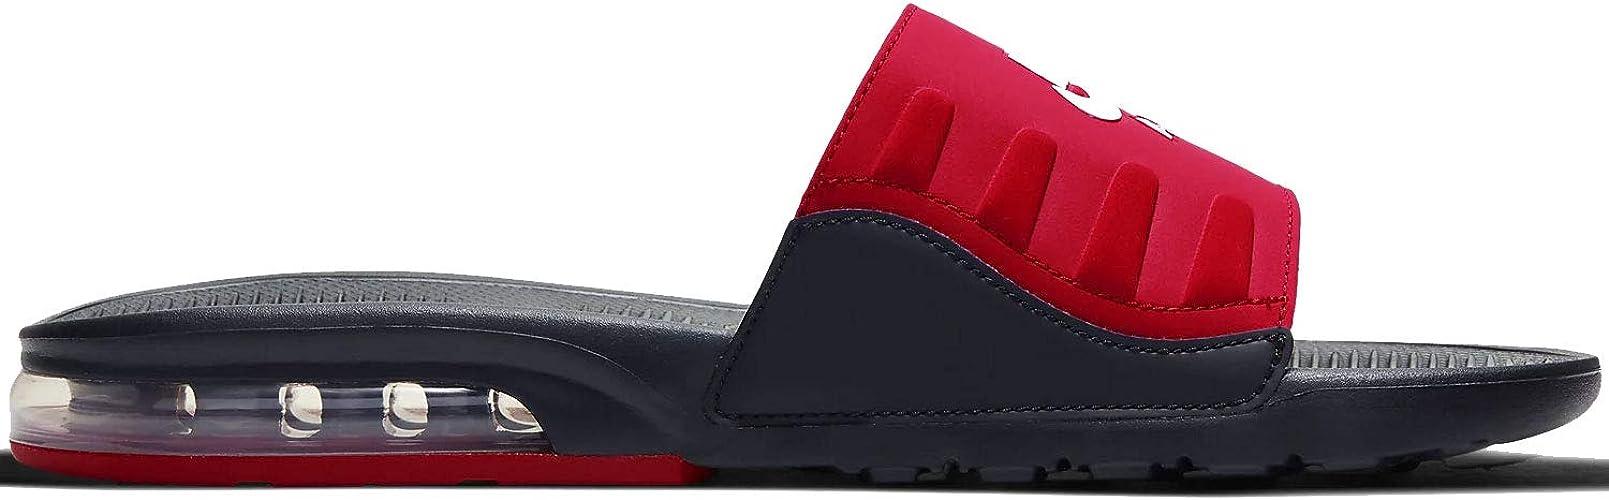 Nike Air Max Camden Slide, Rouge (Noir/rouge/blanc), 47 EU ...